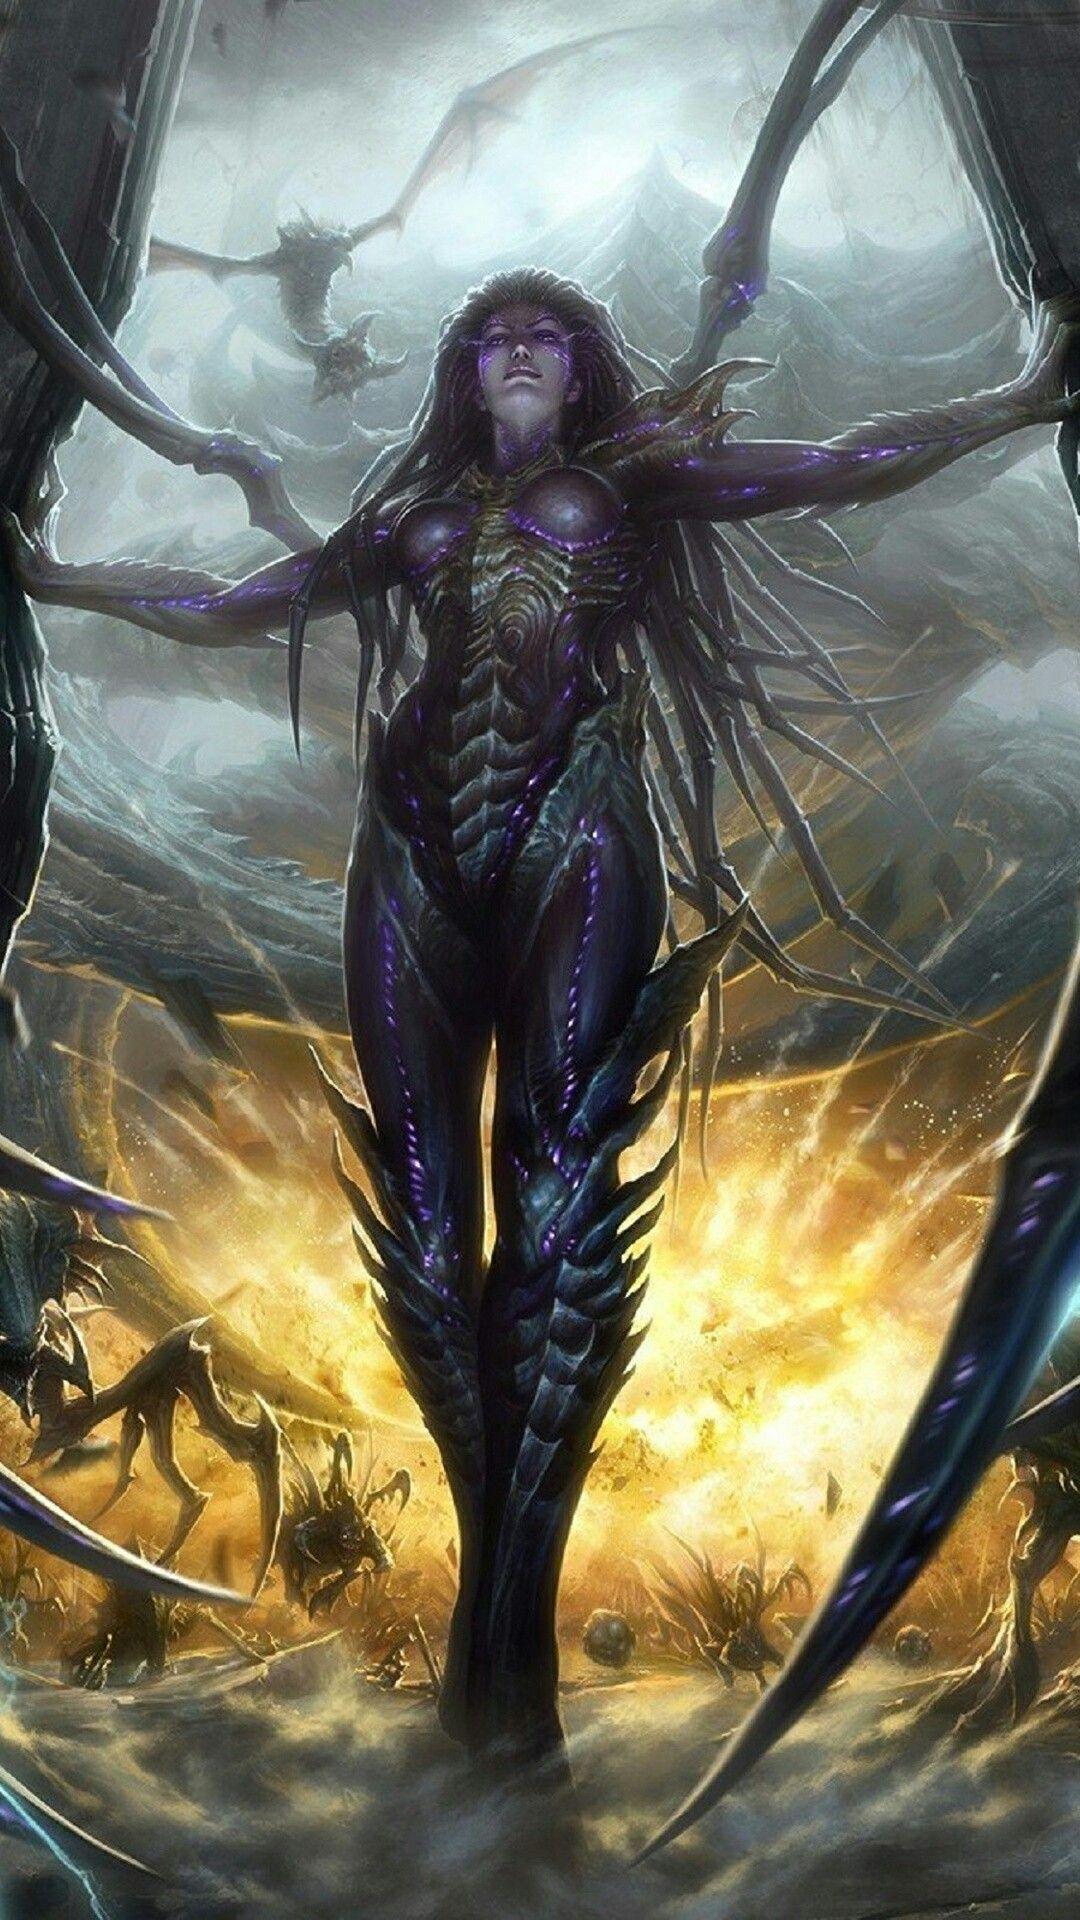 Queen of blades | Kerrigan starcraft, Starcraft, Sarah